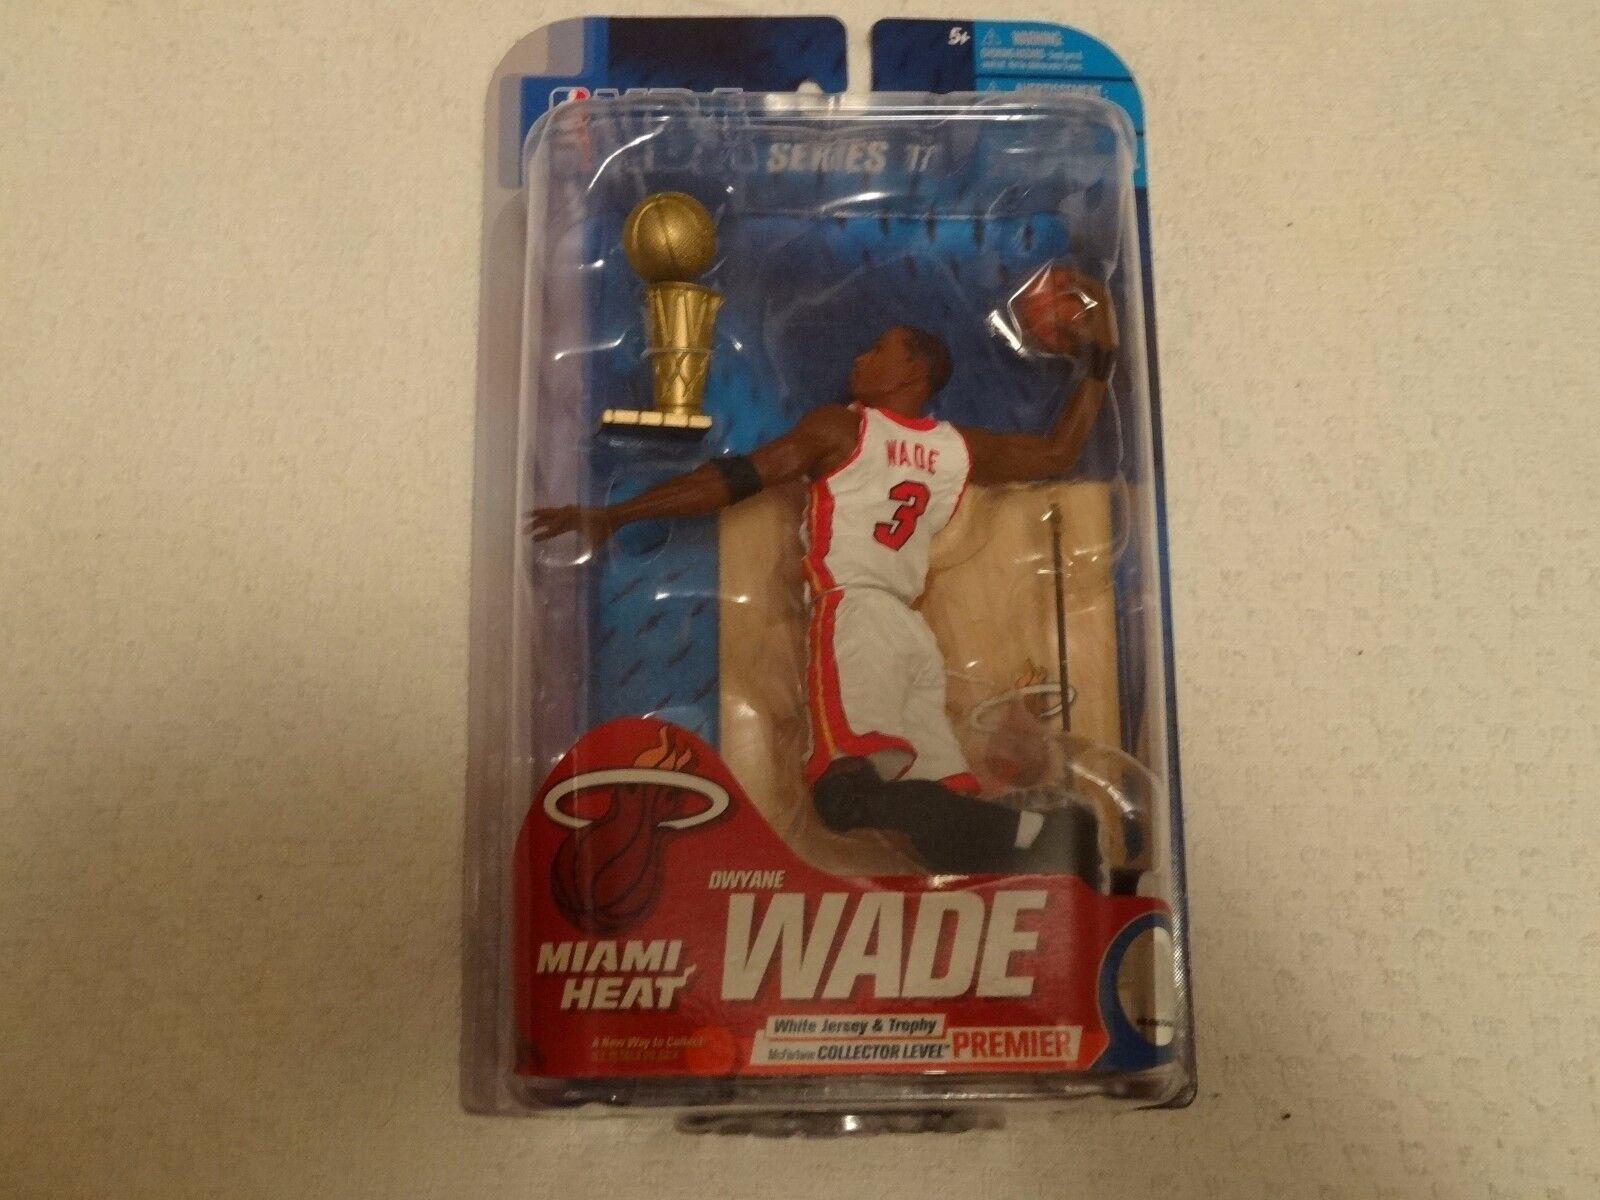 DWYANE WADE Miami Heat NBA Series 17 McFarlane Variant Weiß Premium  63 250